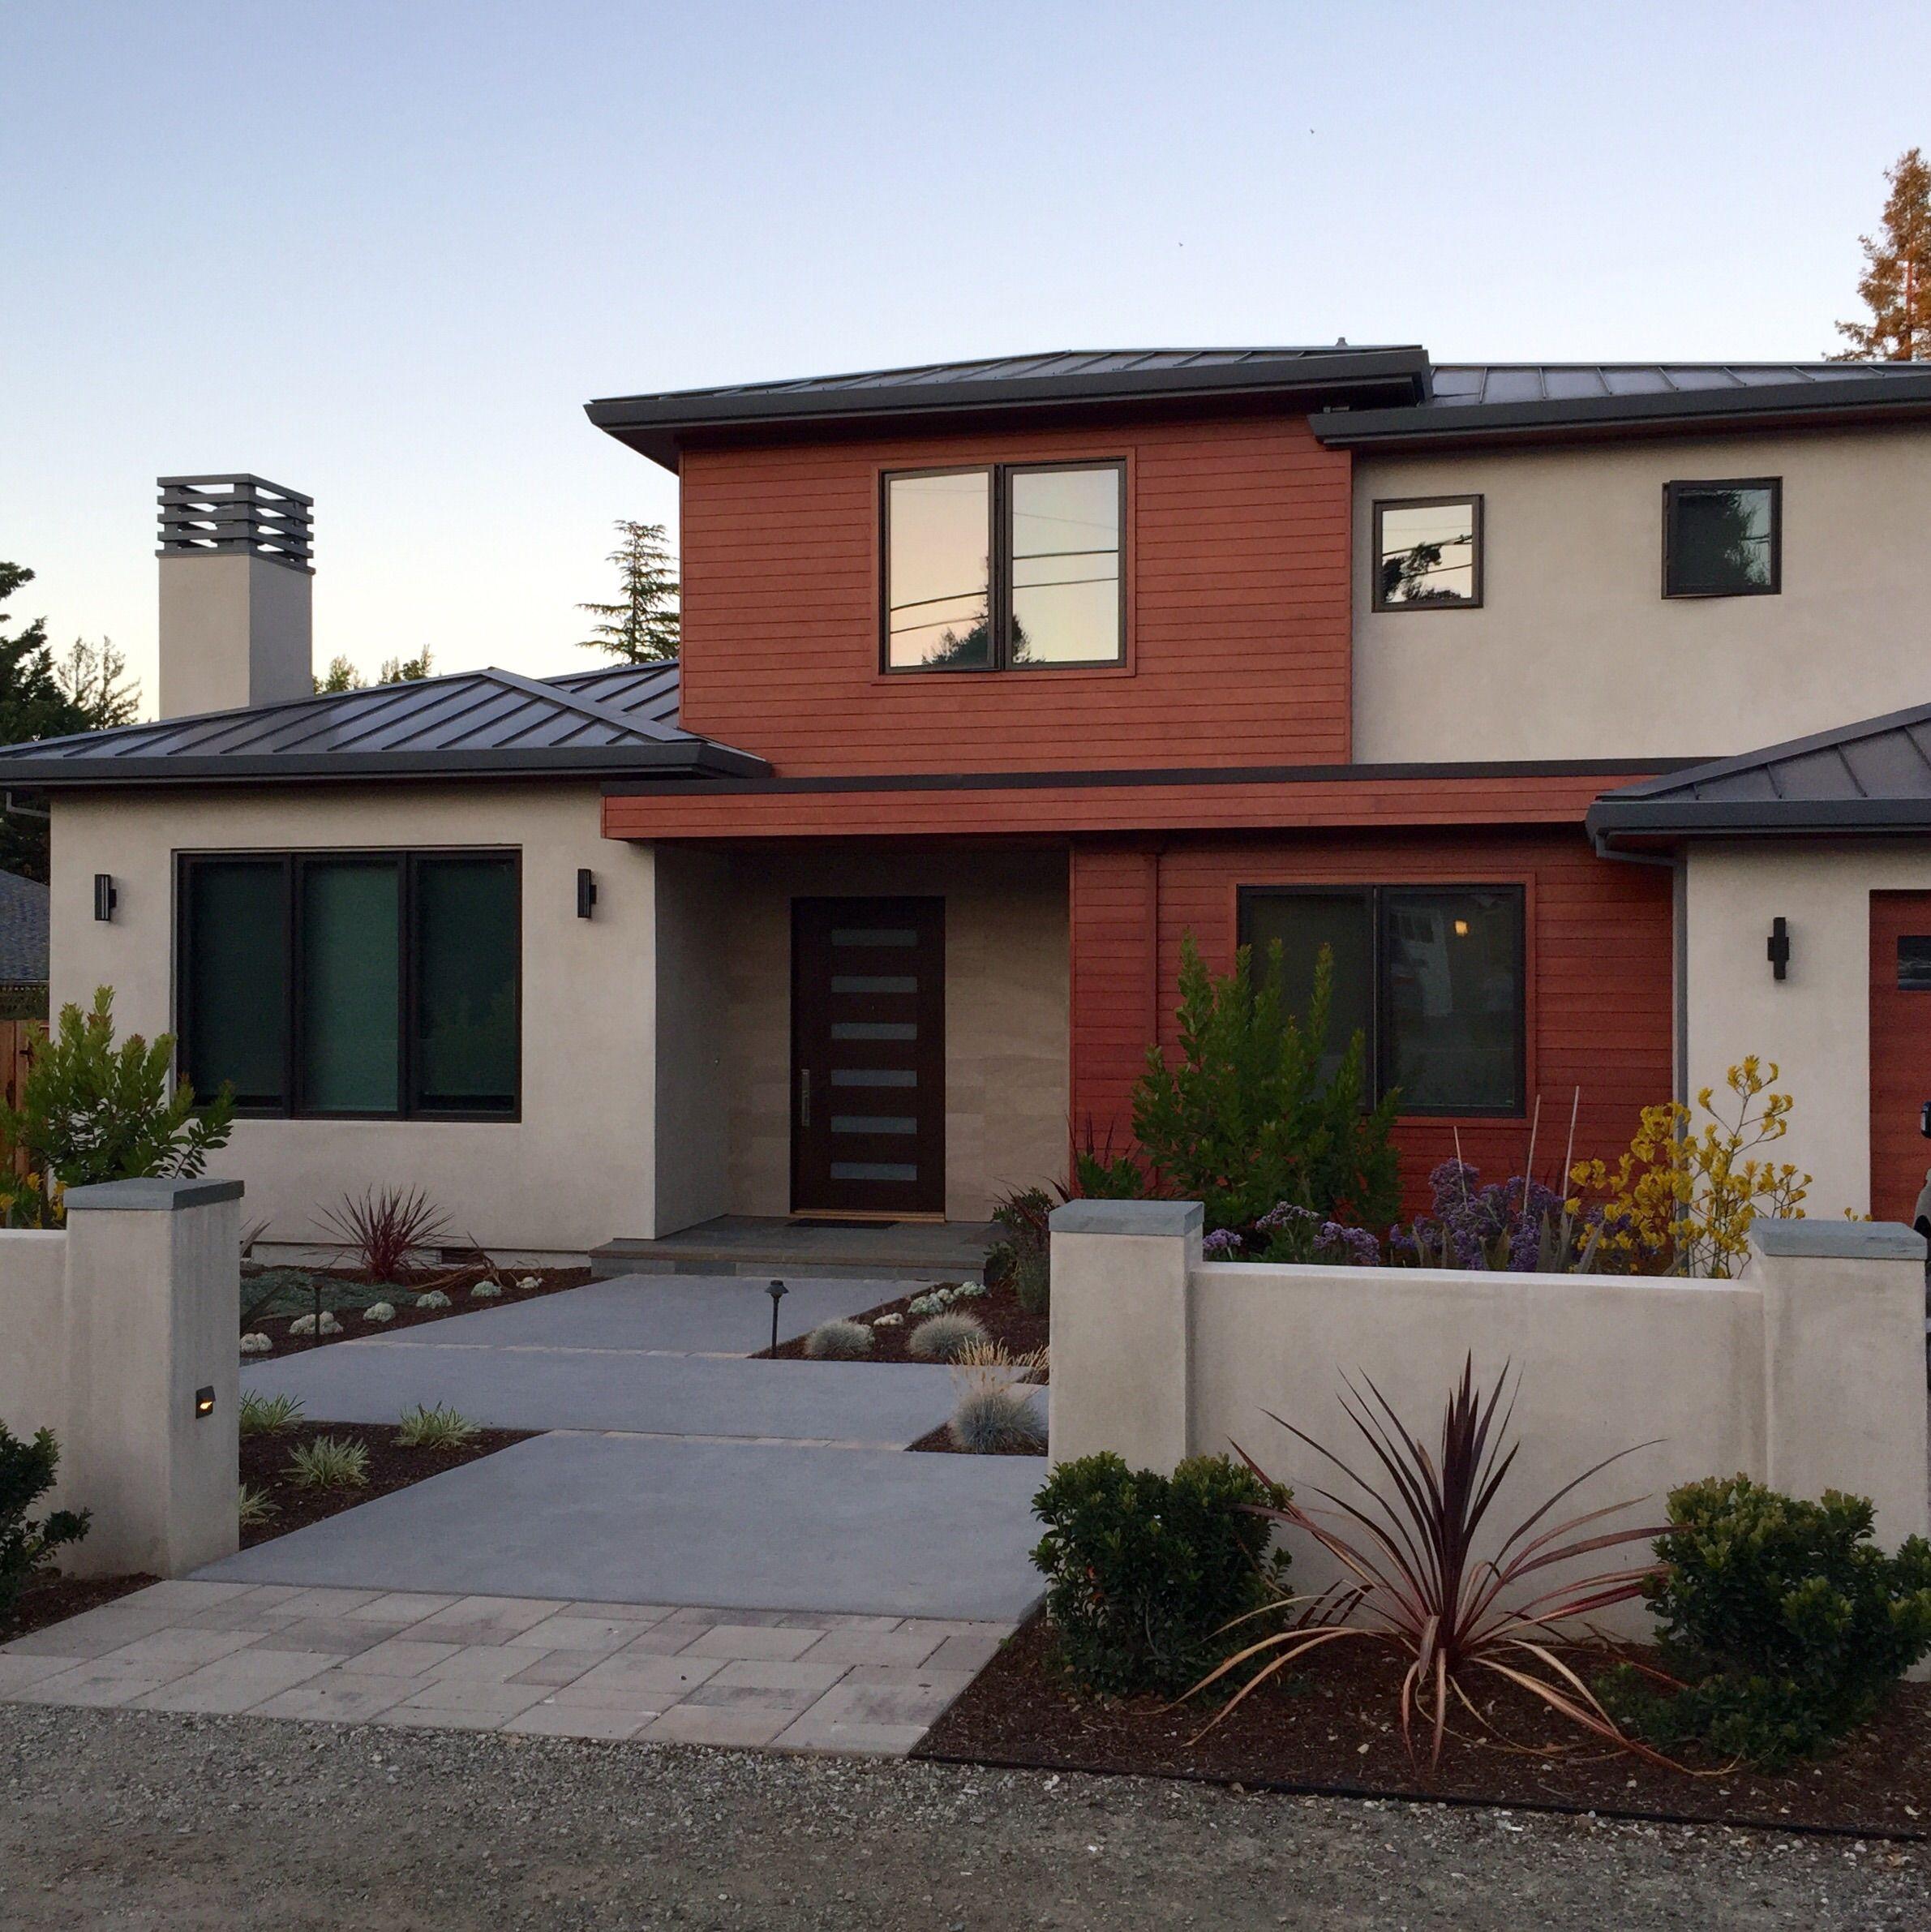 Modern Stucco Home With Rust Colored Siding Stucco Homes House